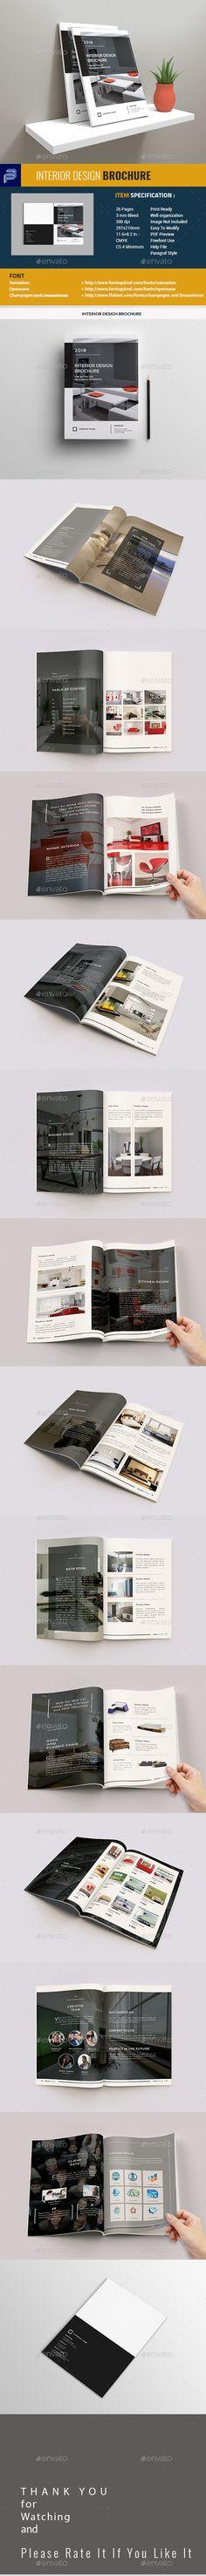 Interior Design Brochure Template InDesign INDD - 26 Pages